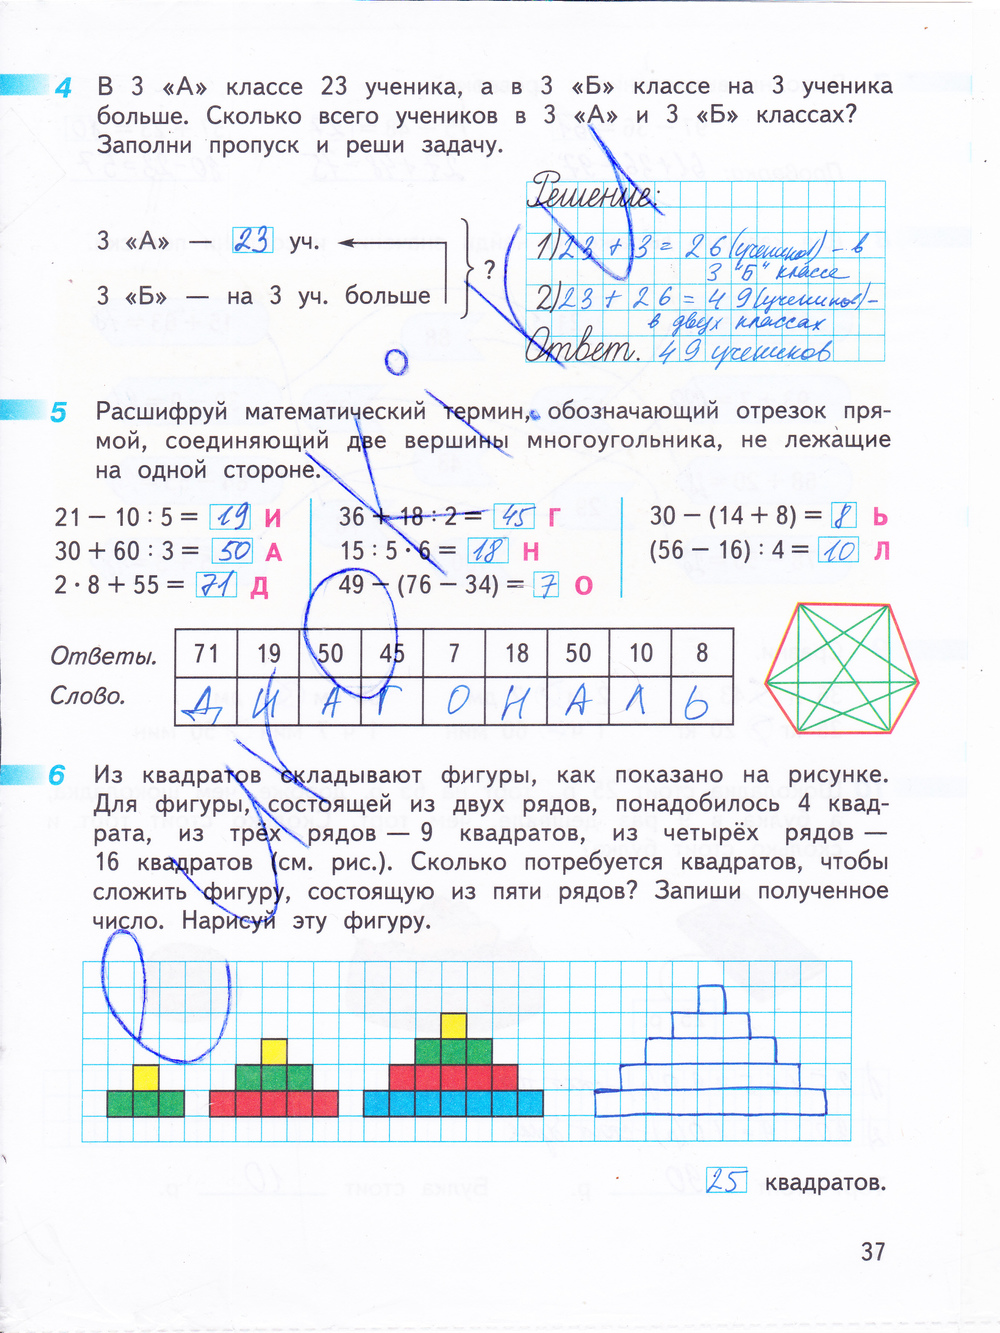 Гдз по математике 4 класс г.в.дорофеев т.н.миракова online